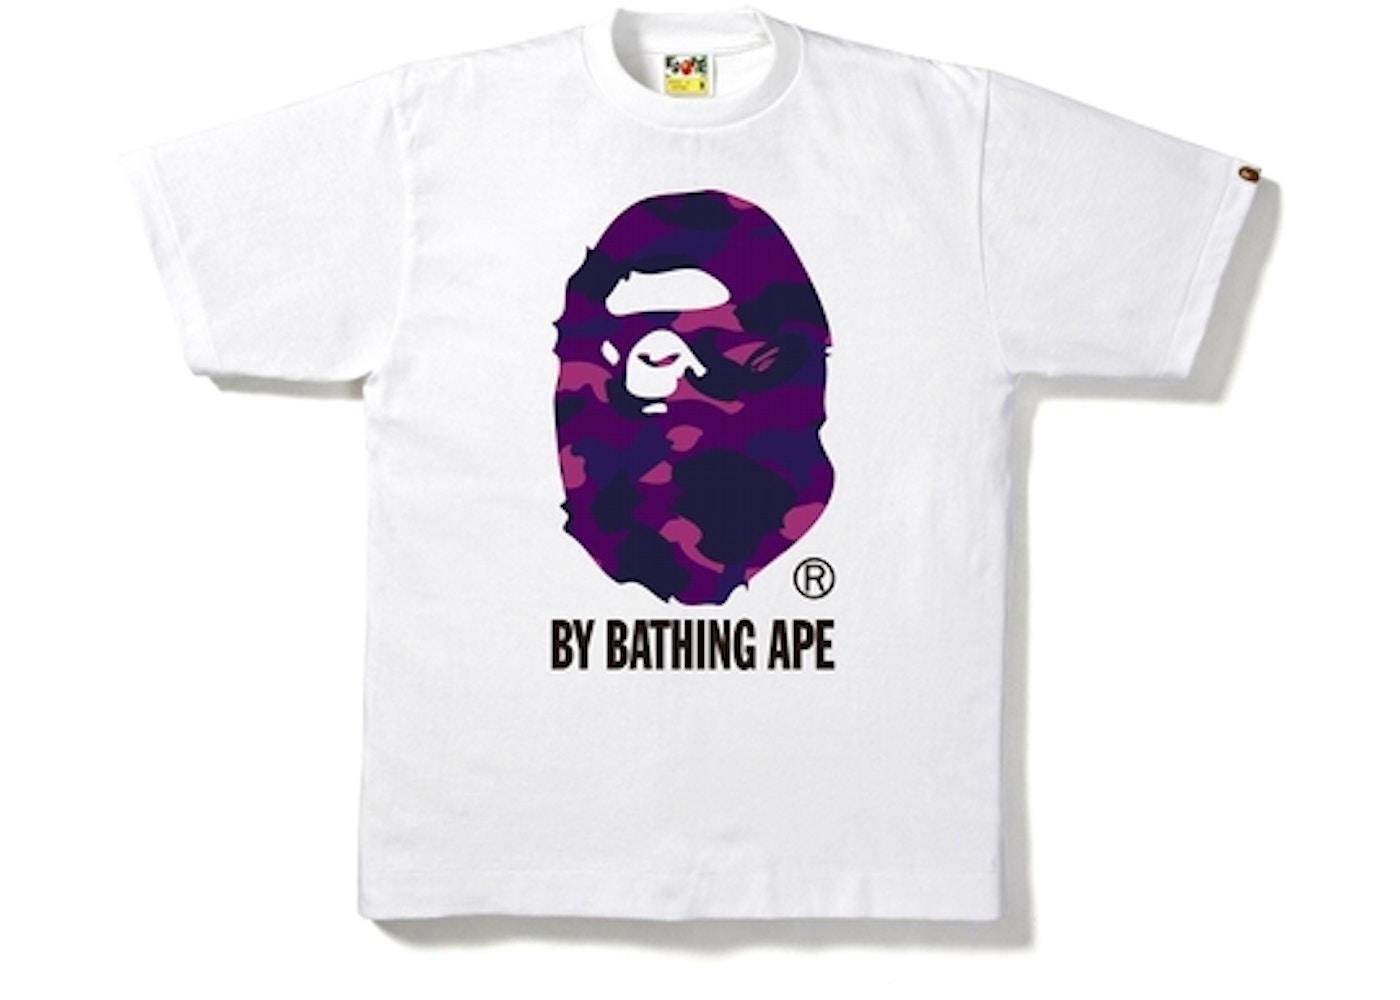 52358995 BAPE Color Camo By Bathing Tee White/Purple -